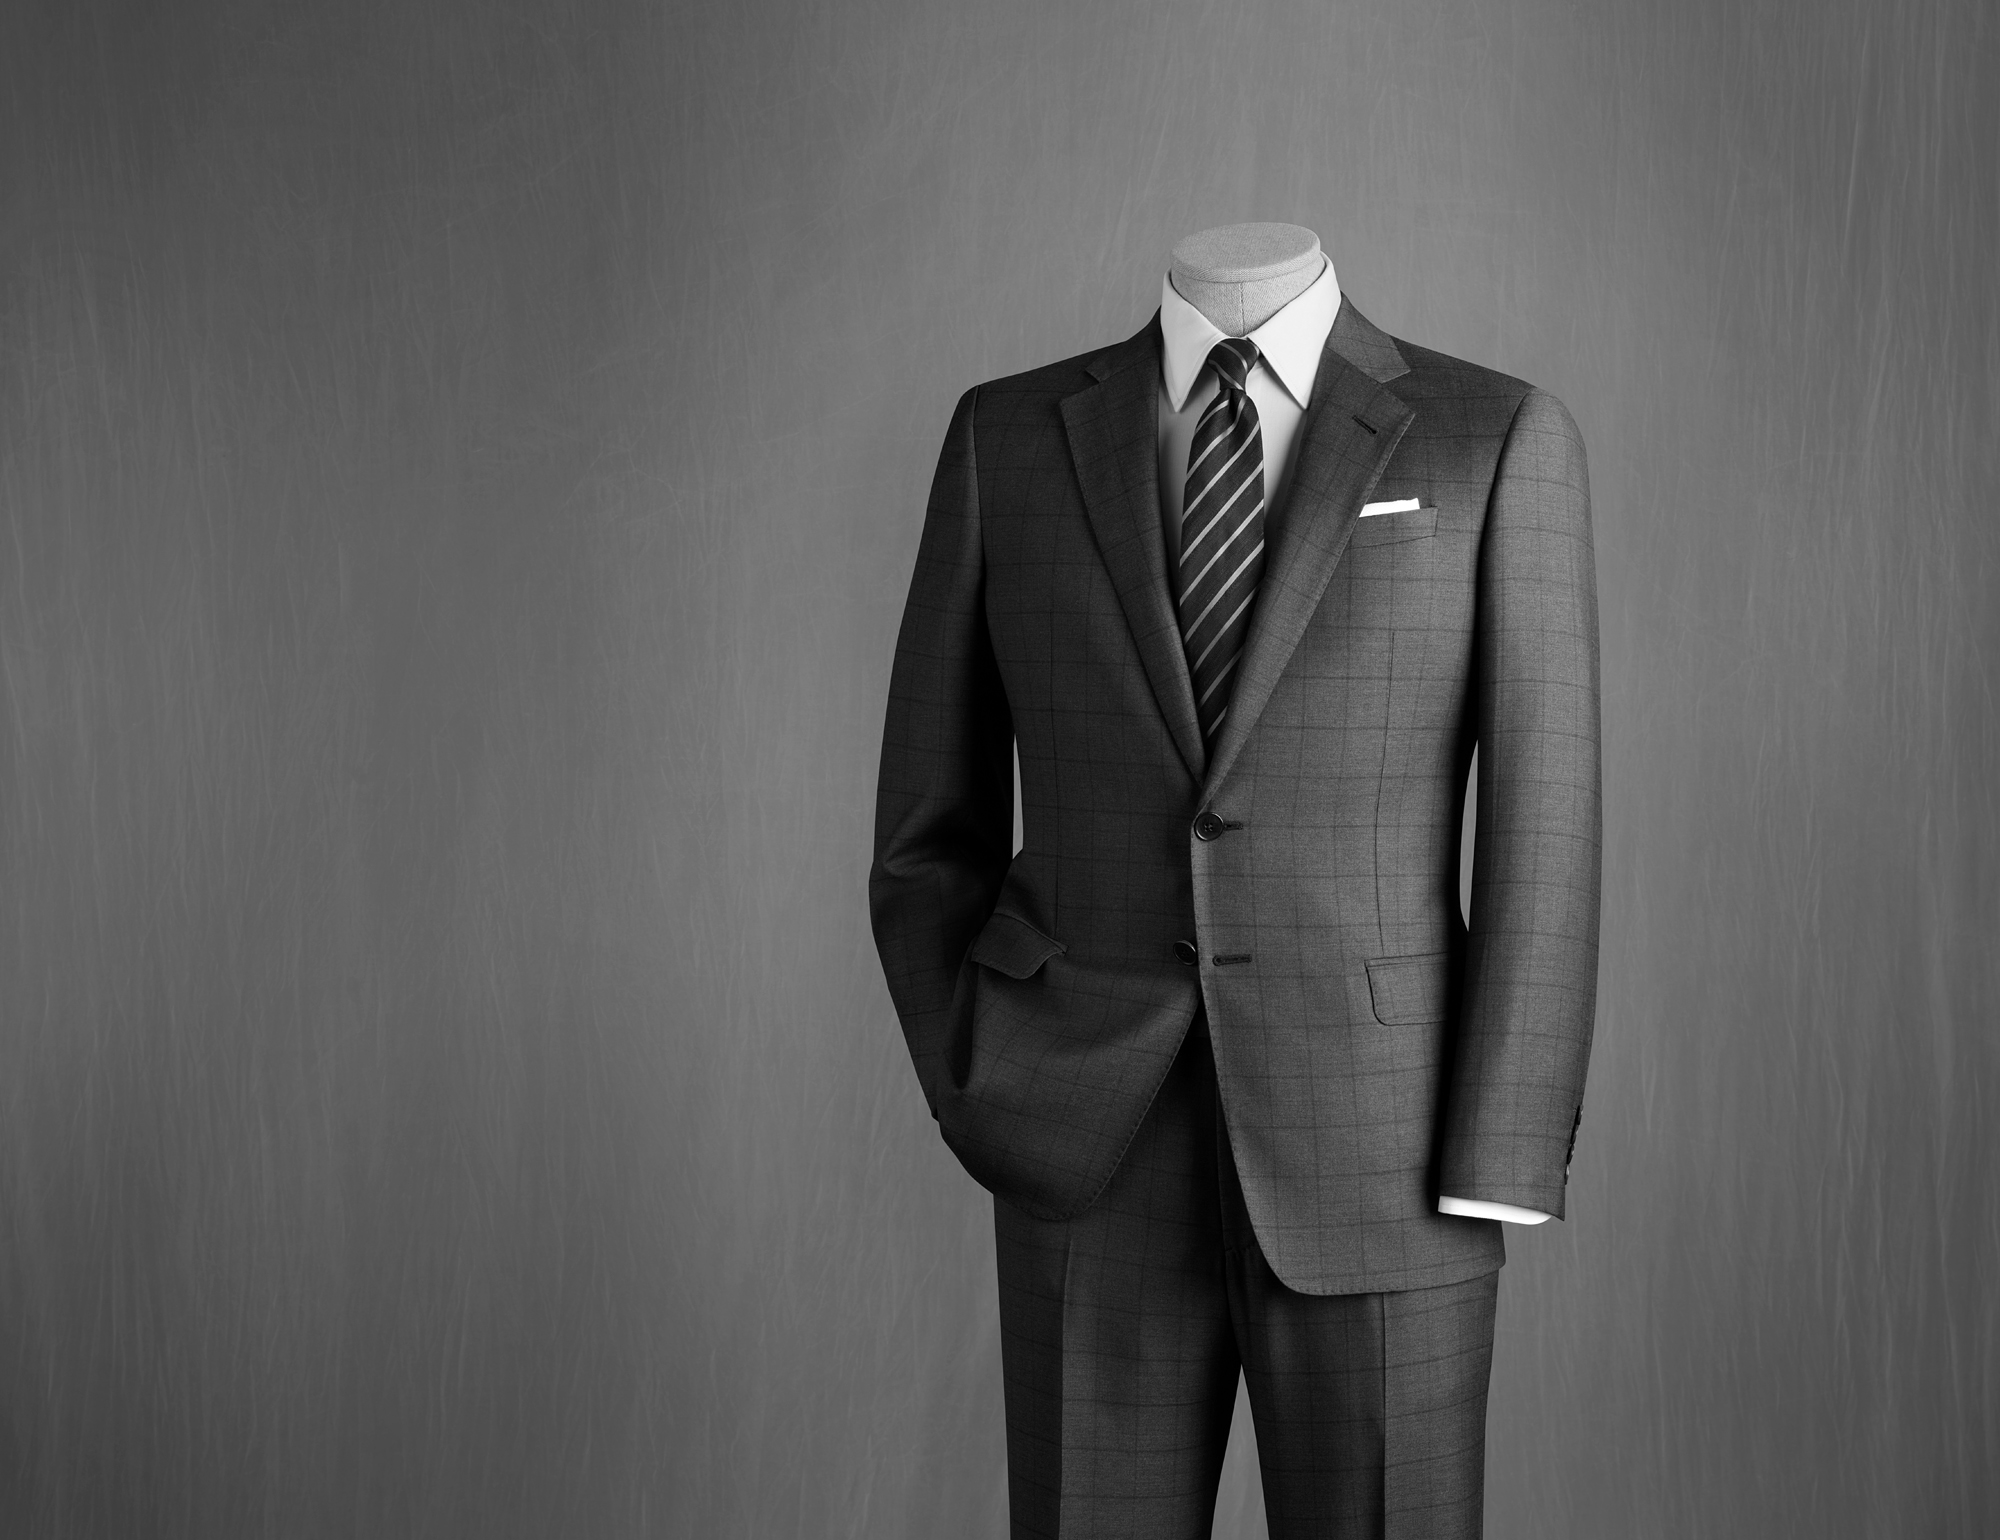 MANNEQUIN DRESSING/ STYLING - Dee Tranchitella/ Creative Imagestella2dee@aol.com